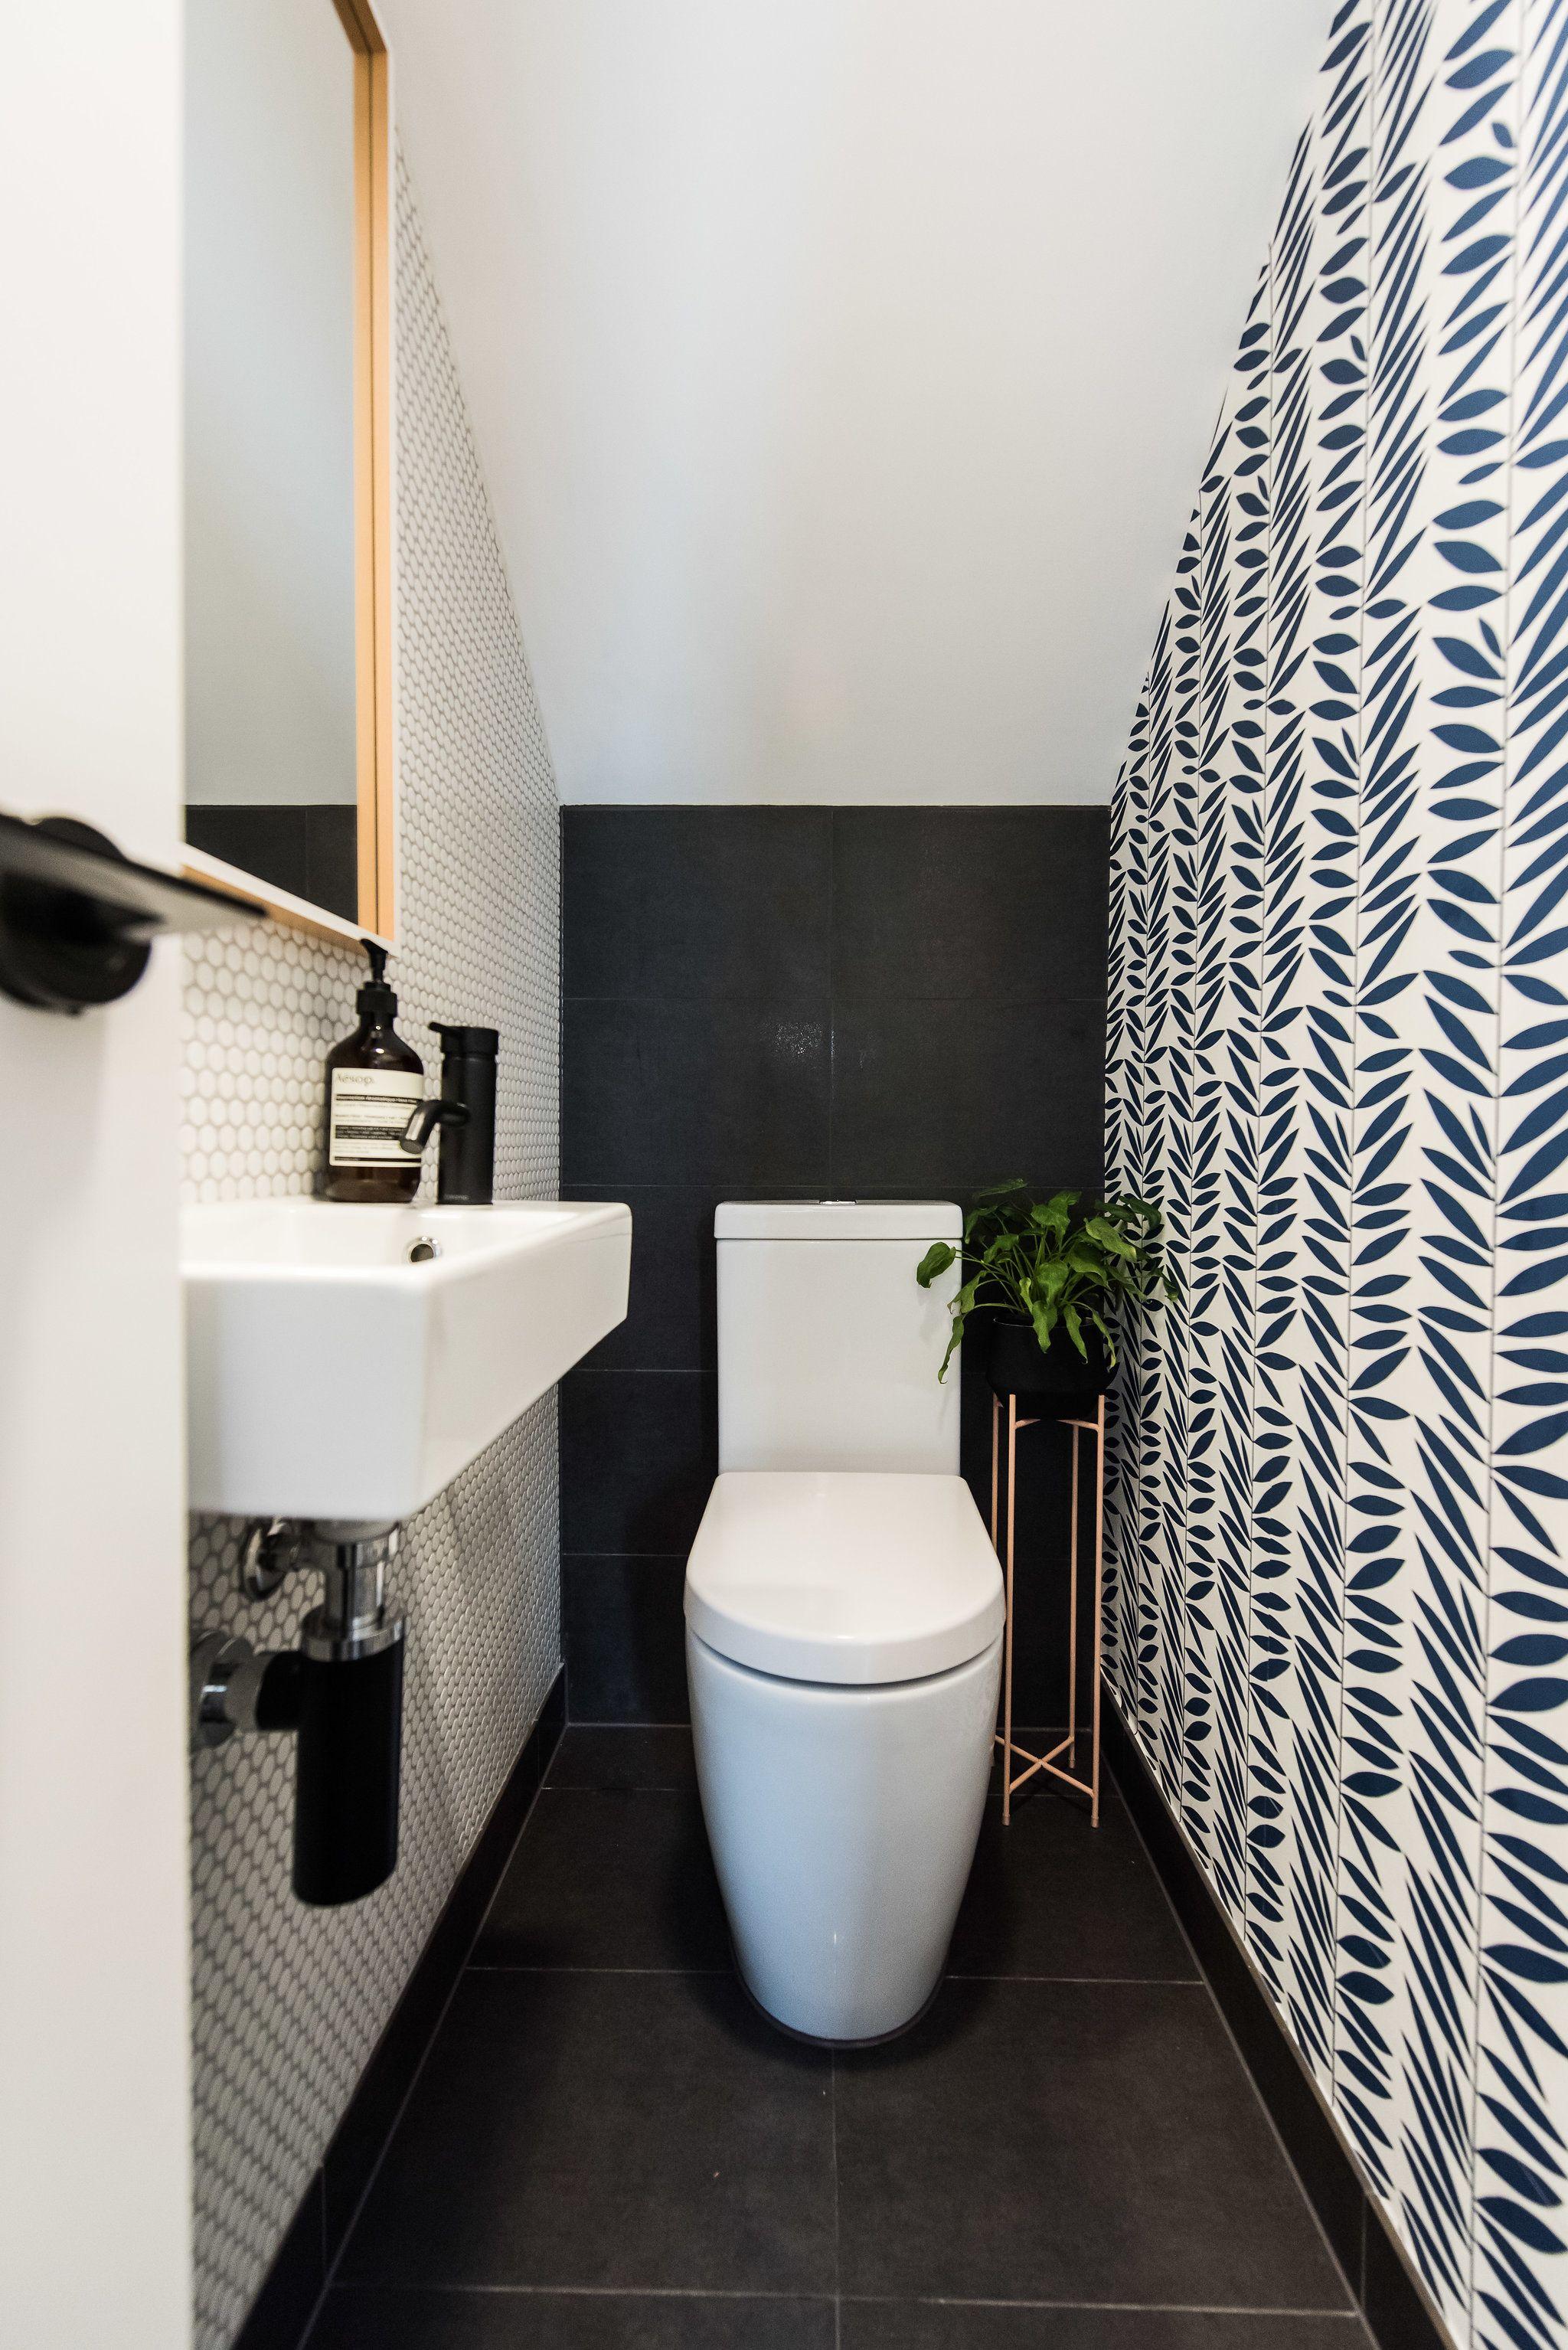 Small Comfort Room Tiles Design: Sandringham Project - Powder Room 2